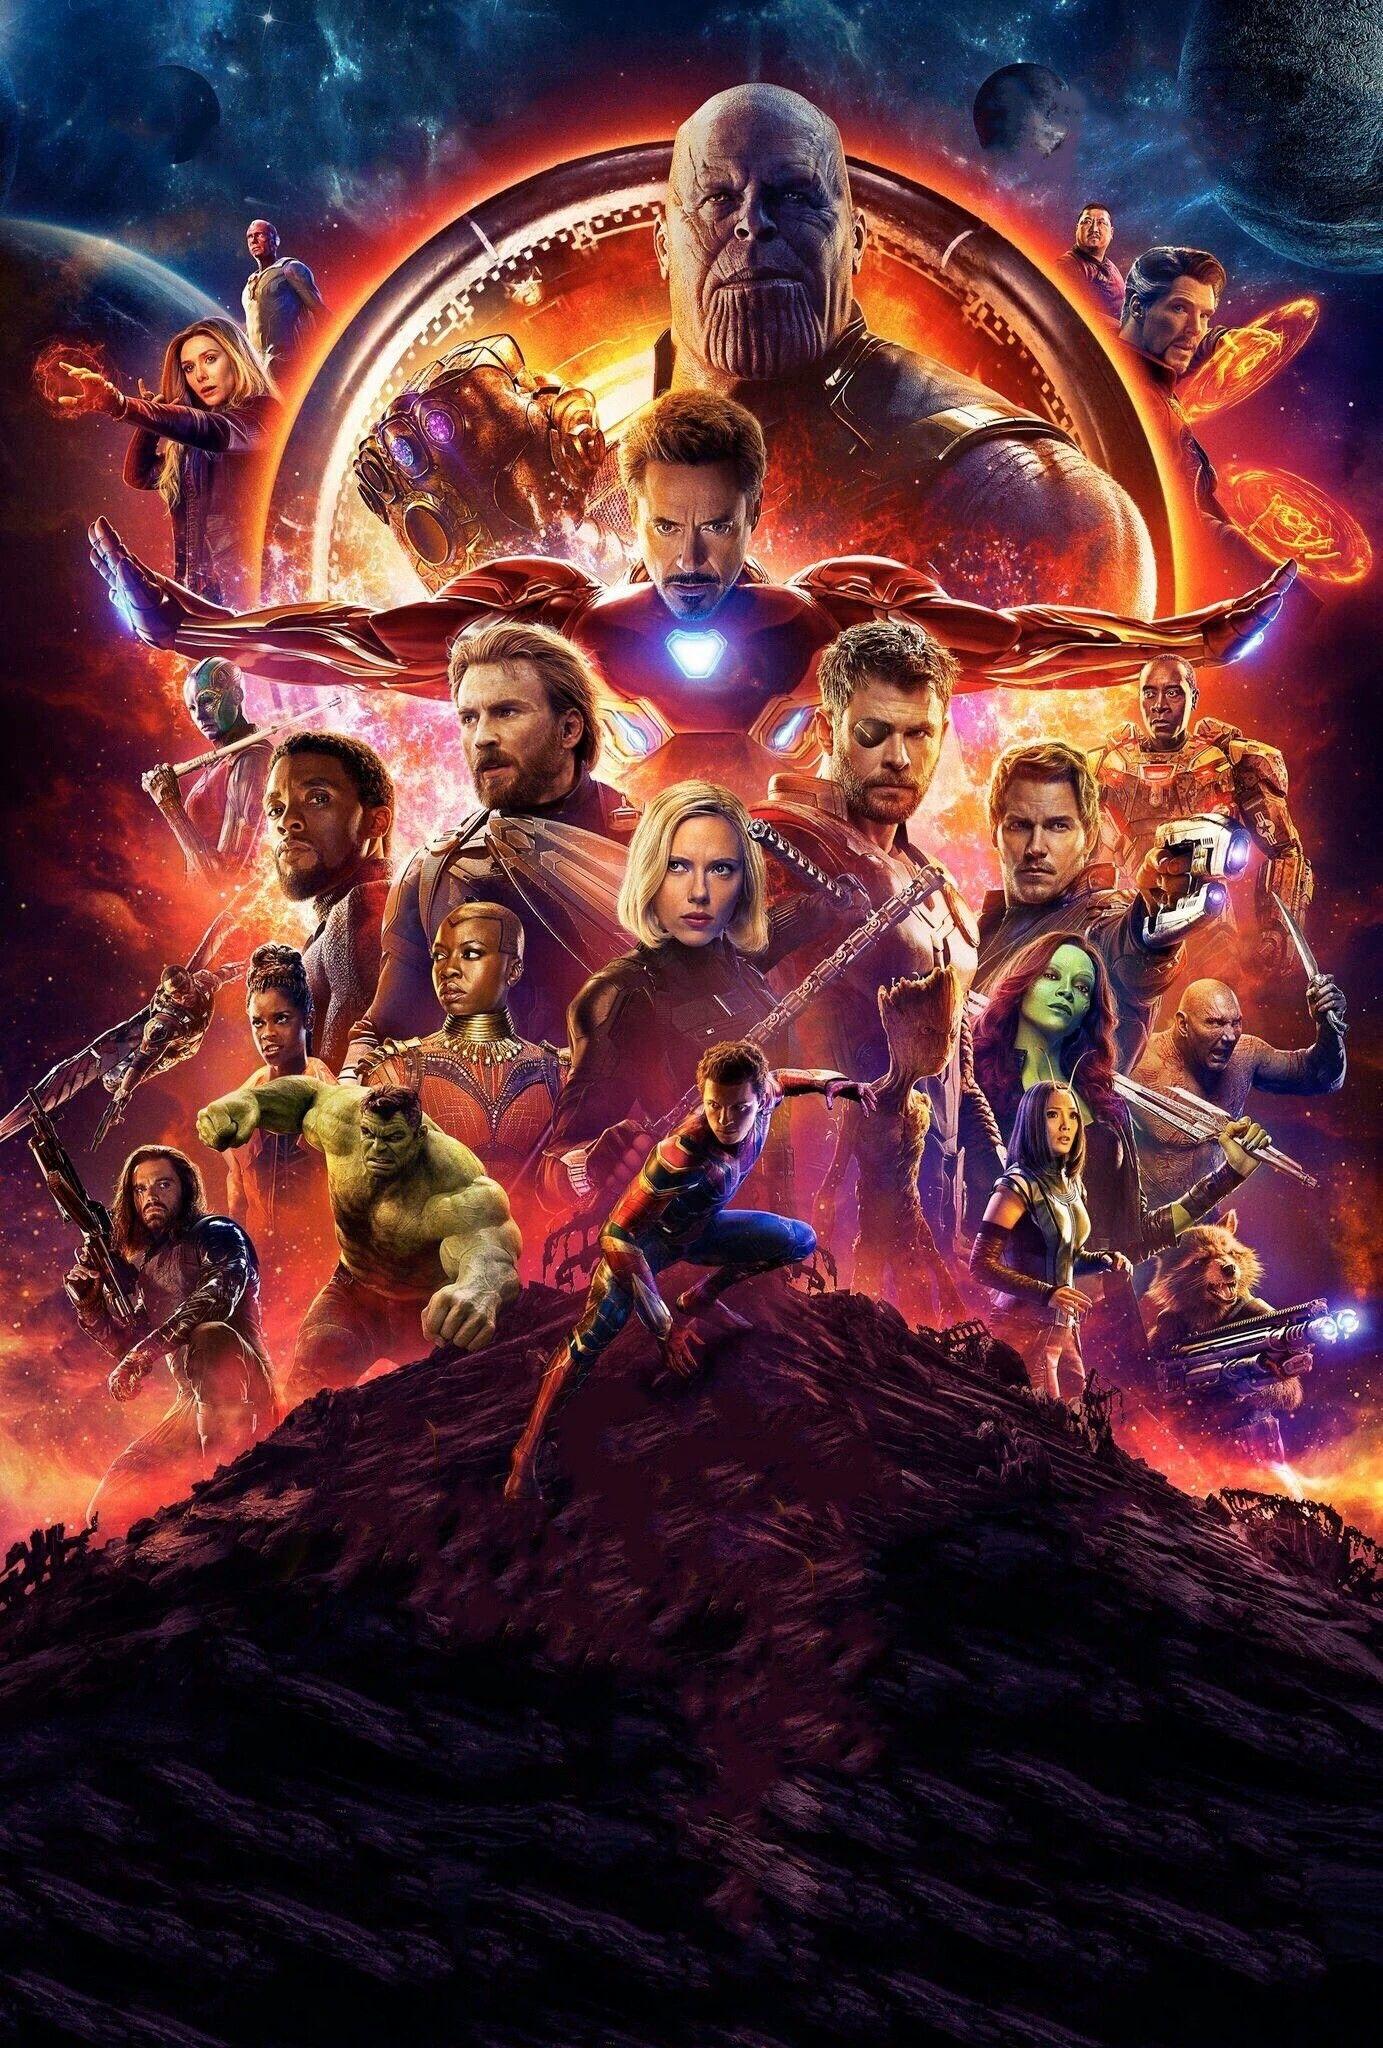 Avengers | Fond d'écran avengers, Fond d'écran marvel, Héros marvel